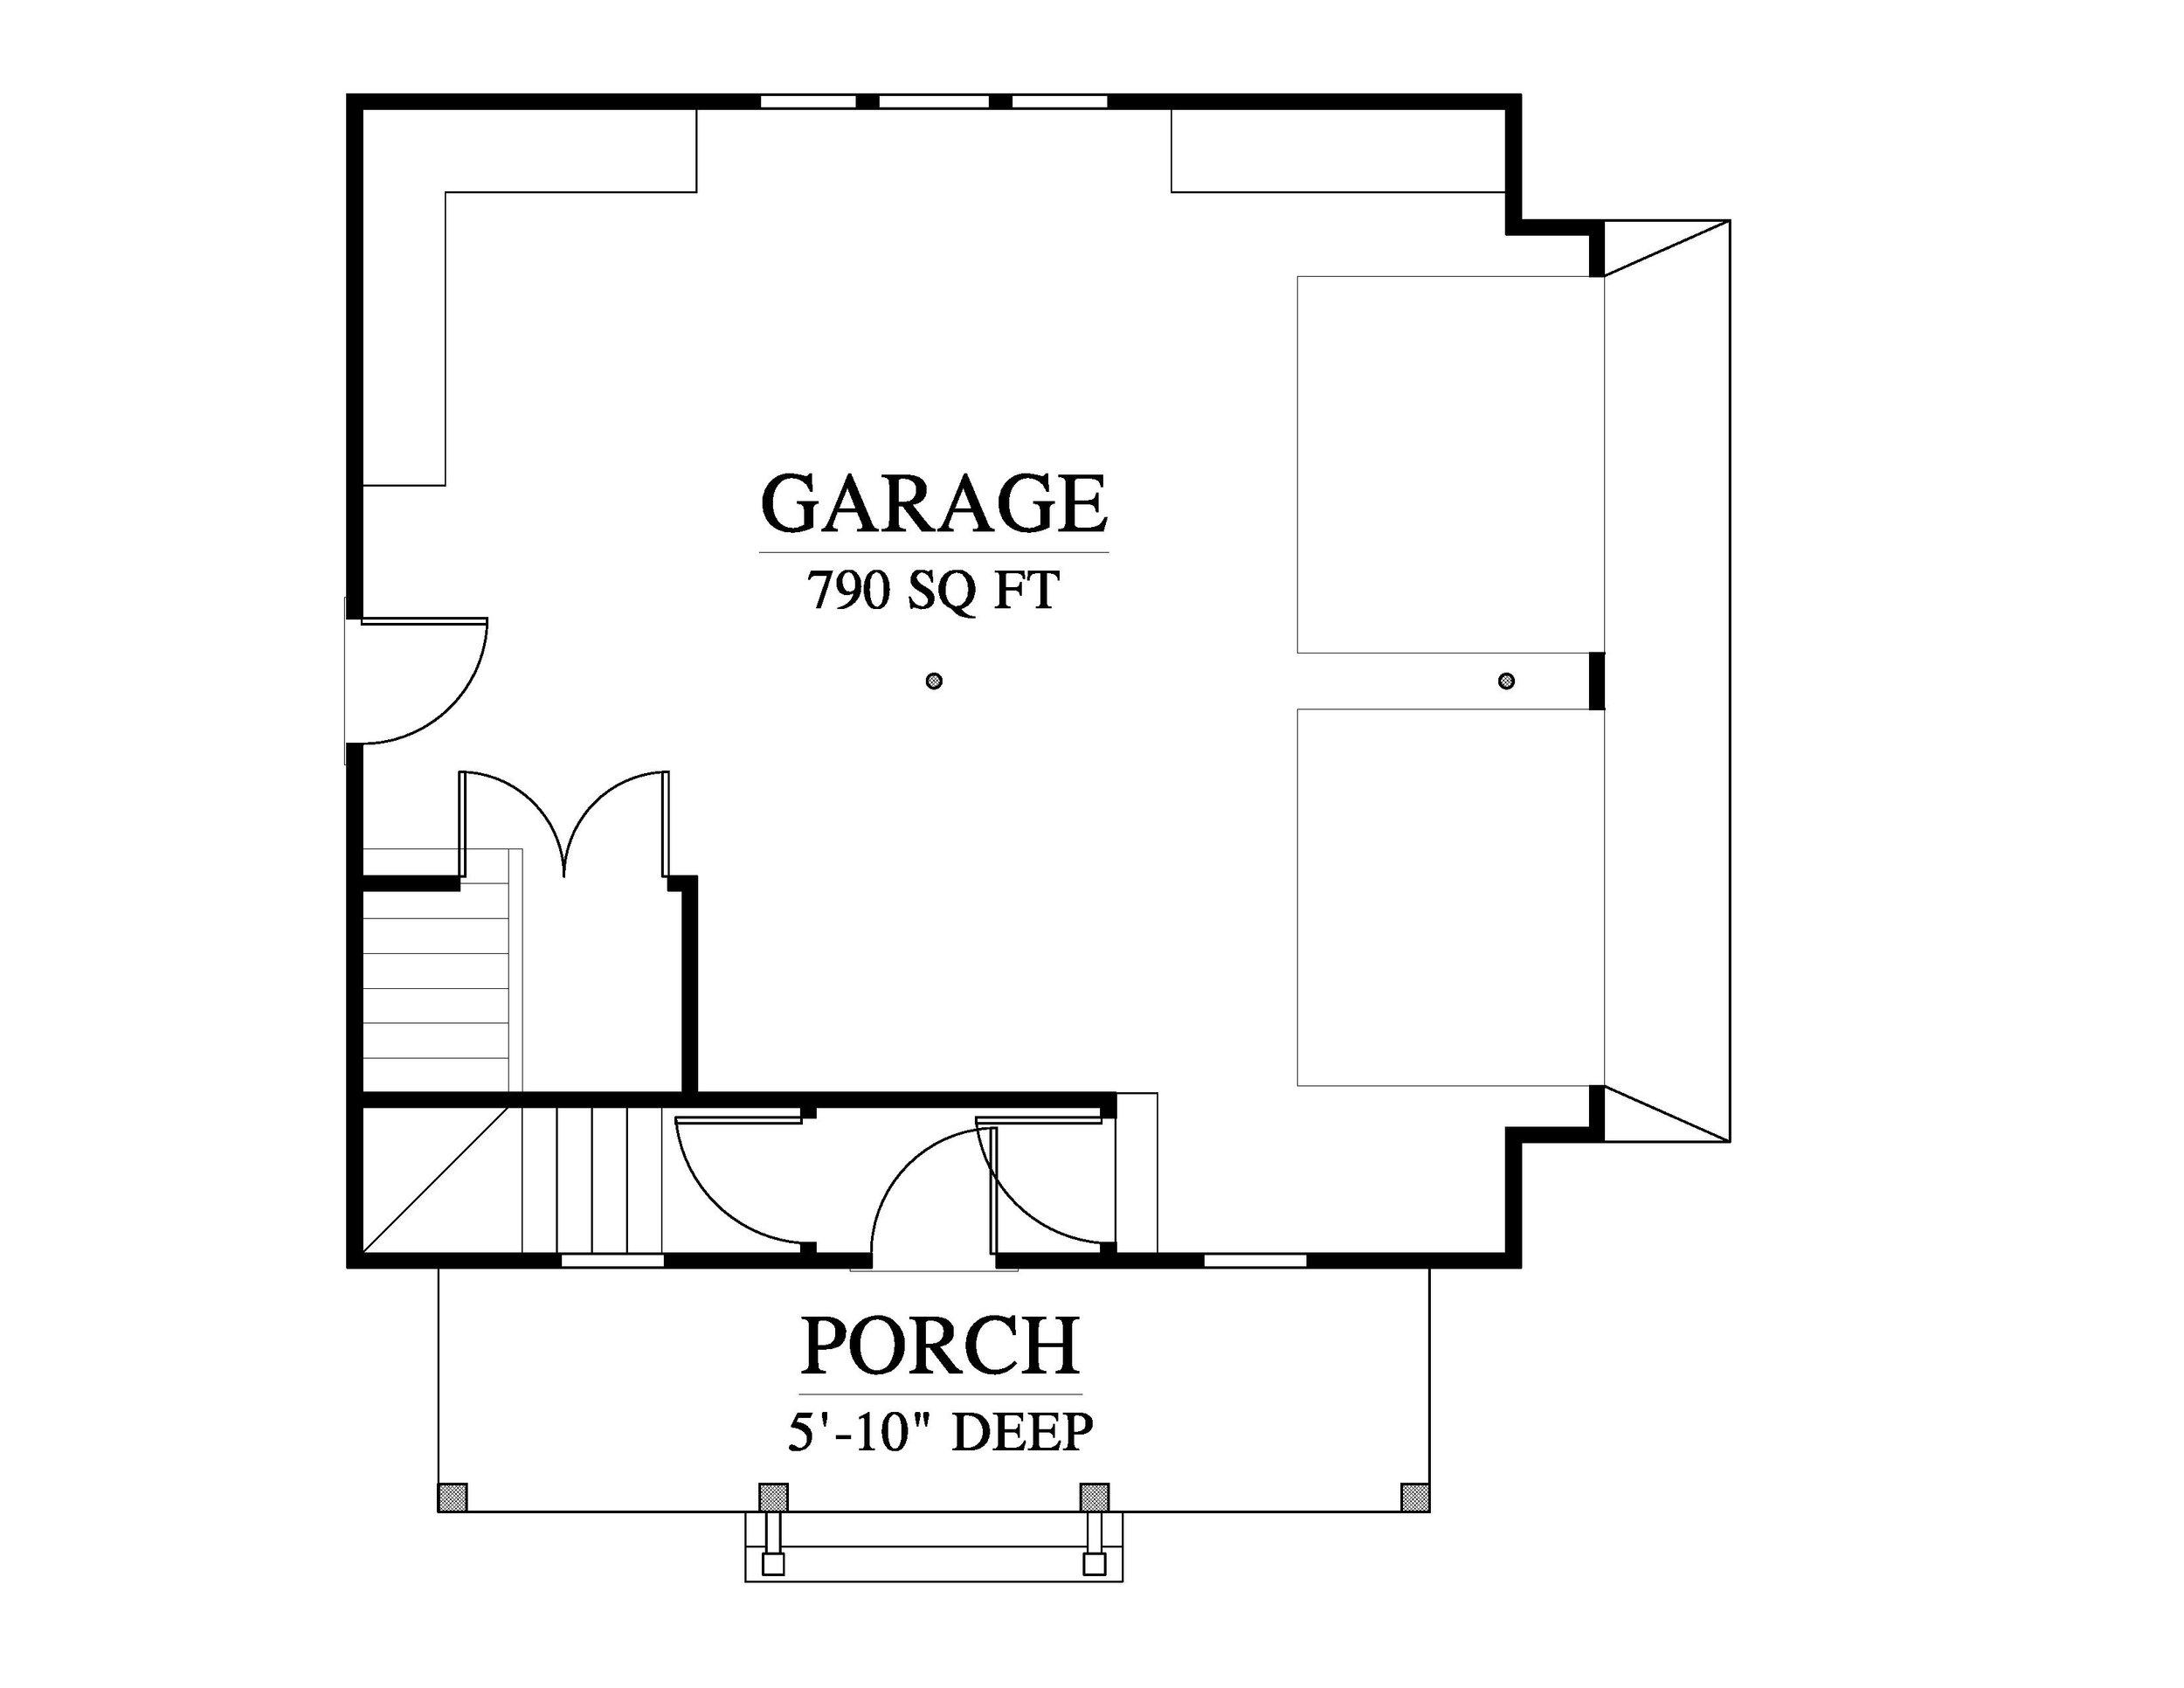 Camden garage floorplan floor 1-page-001.jpg